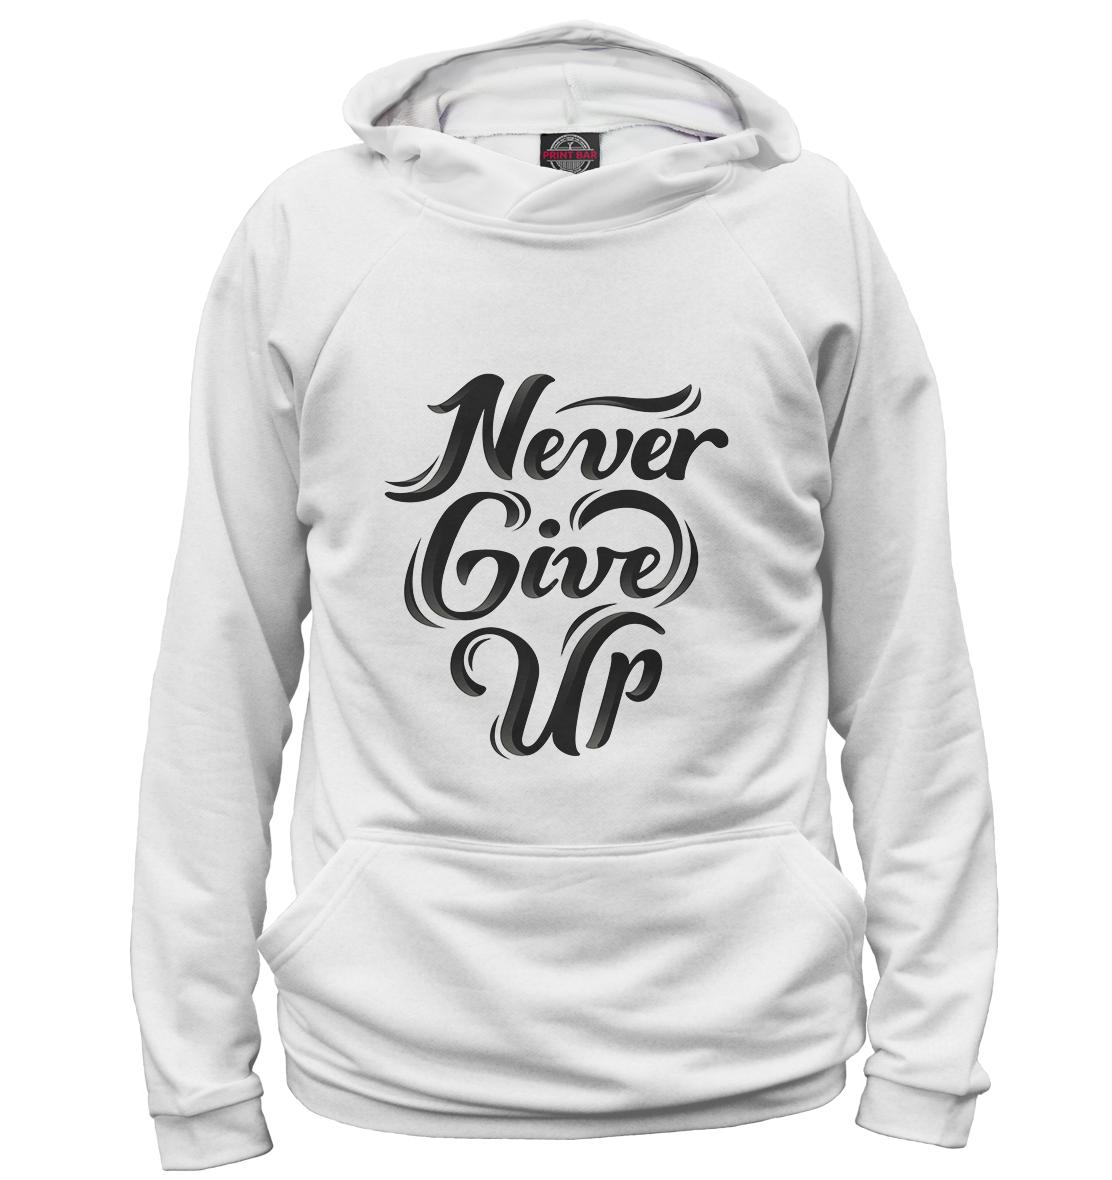 «Never Give UP» — худи женское, артикул: TIV-257716-hud-1